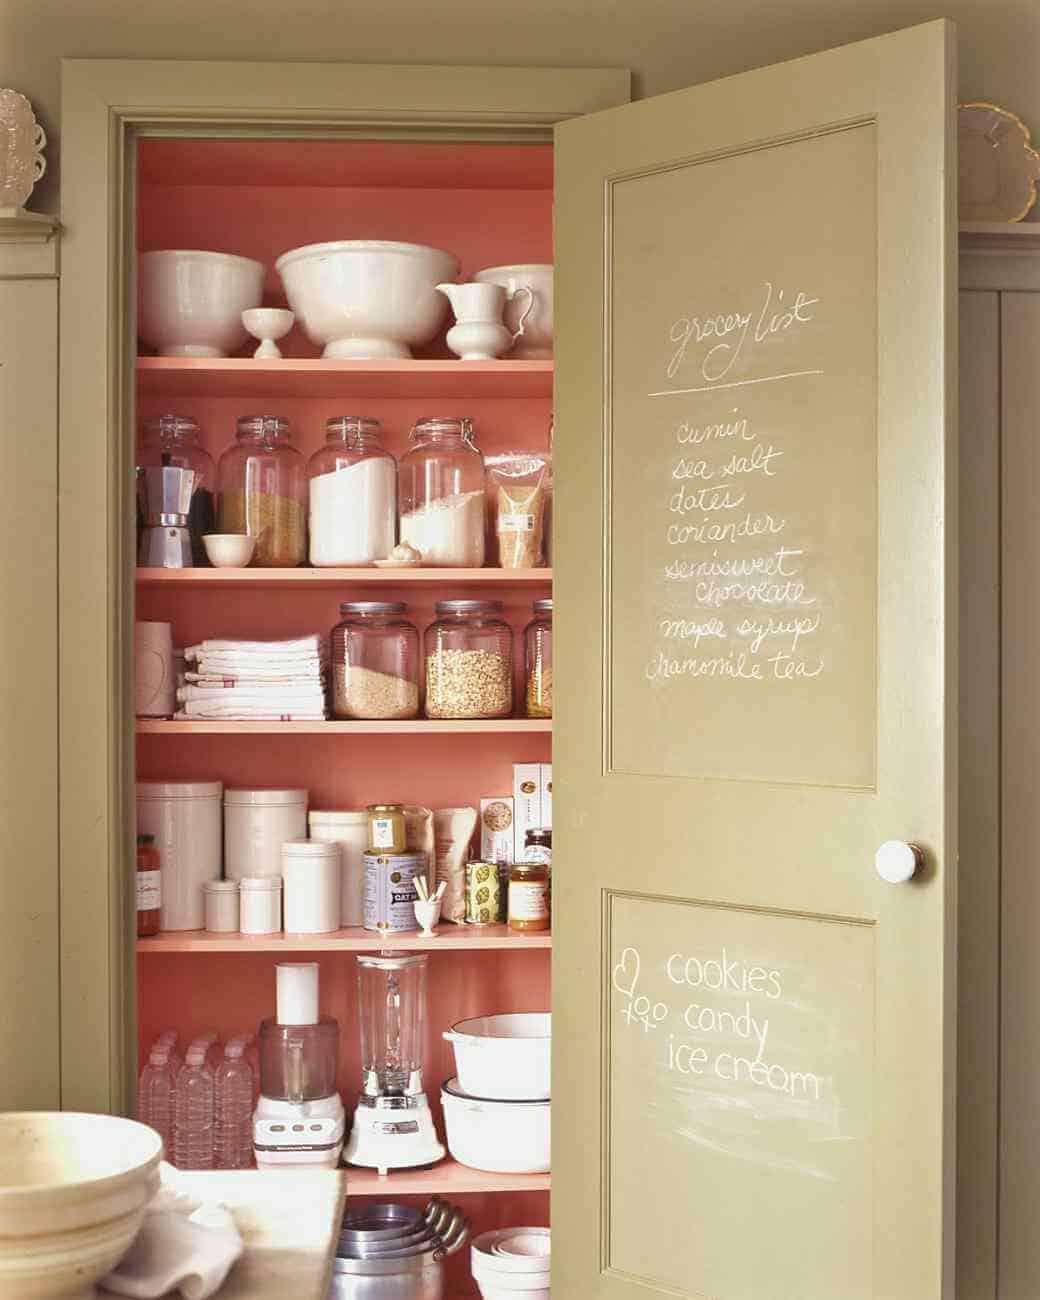 chalk up your doors | @meccinteriors | design bites